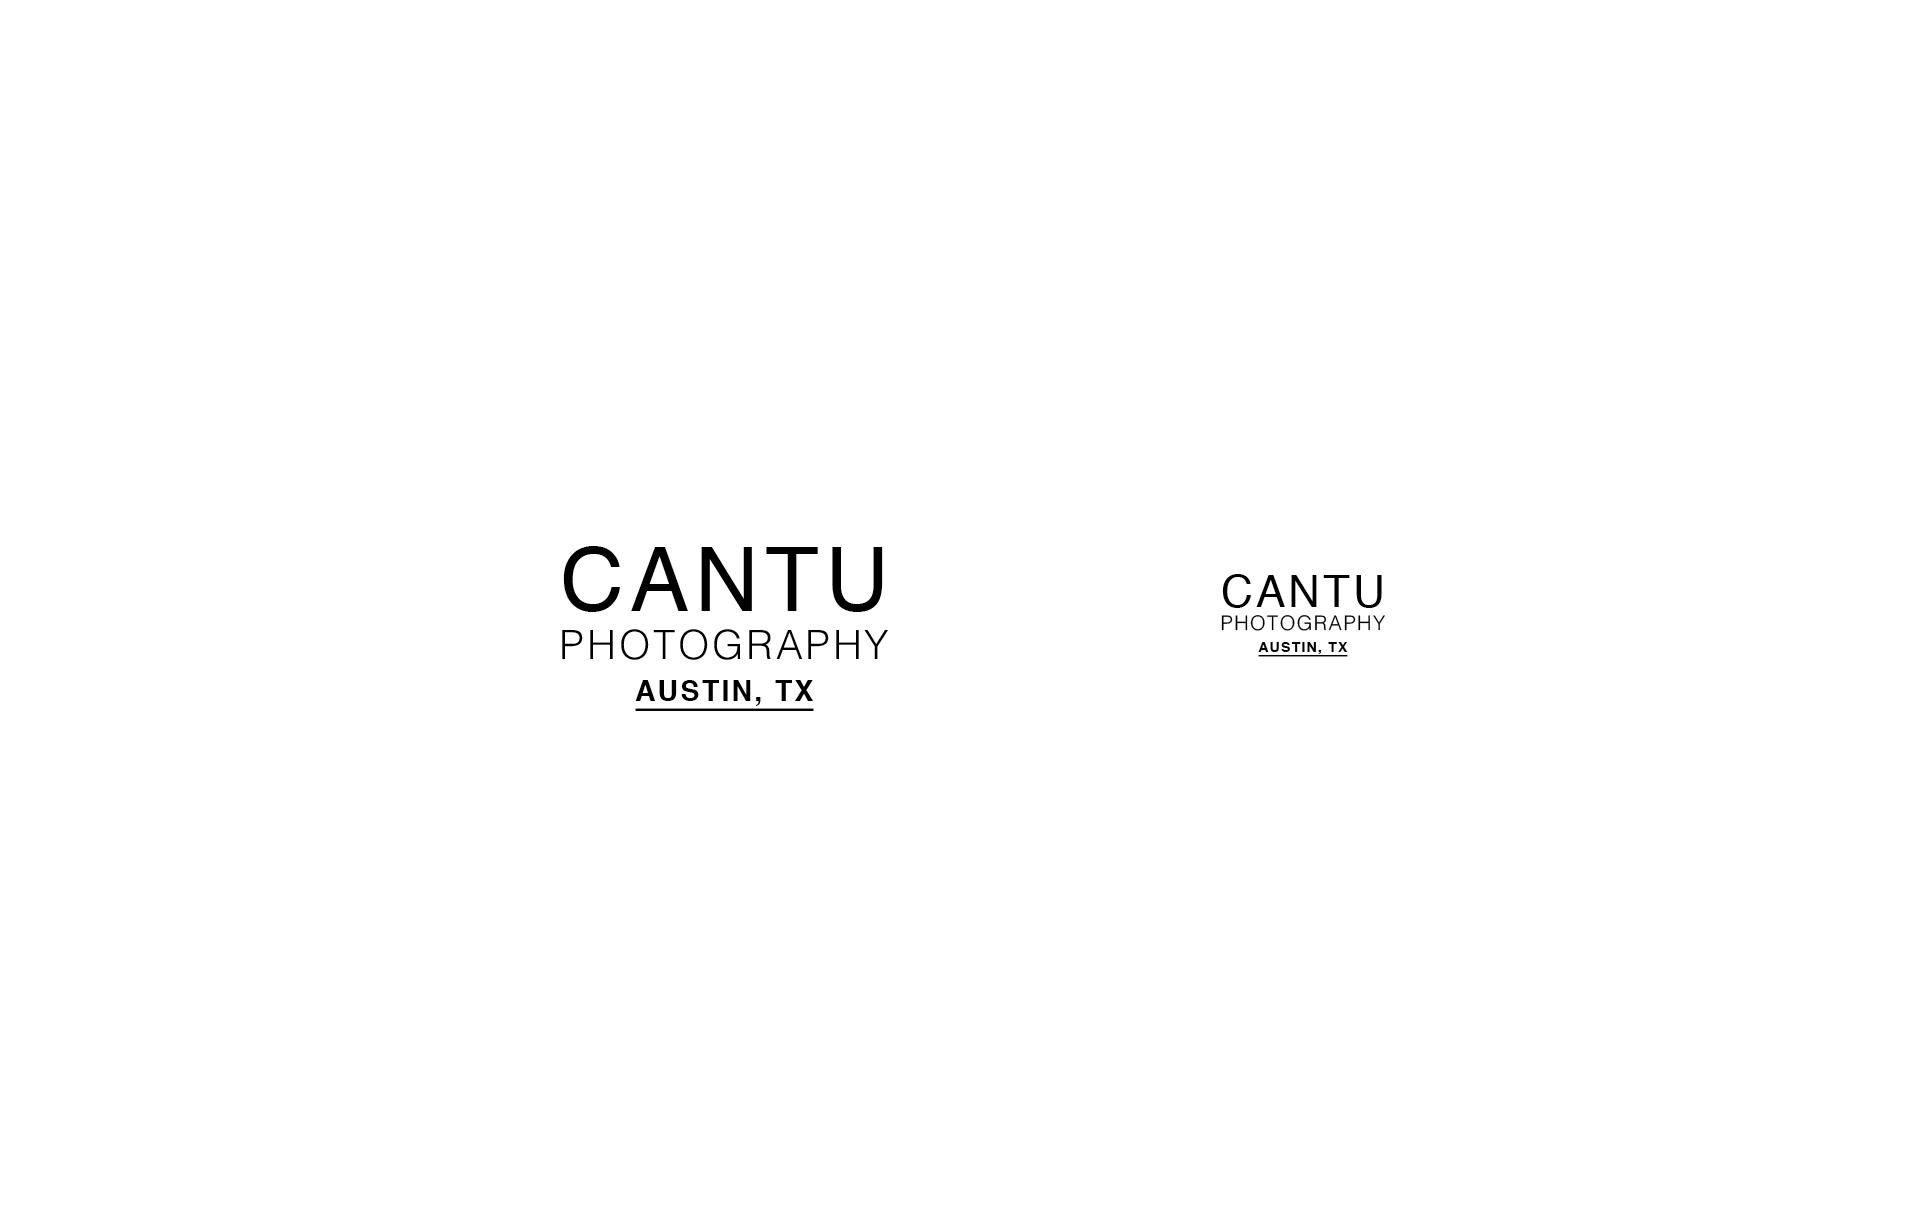 cantu photo design art direction